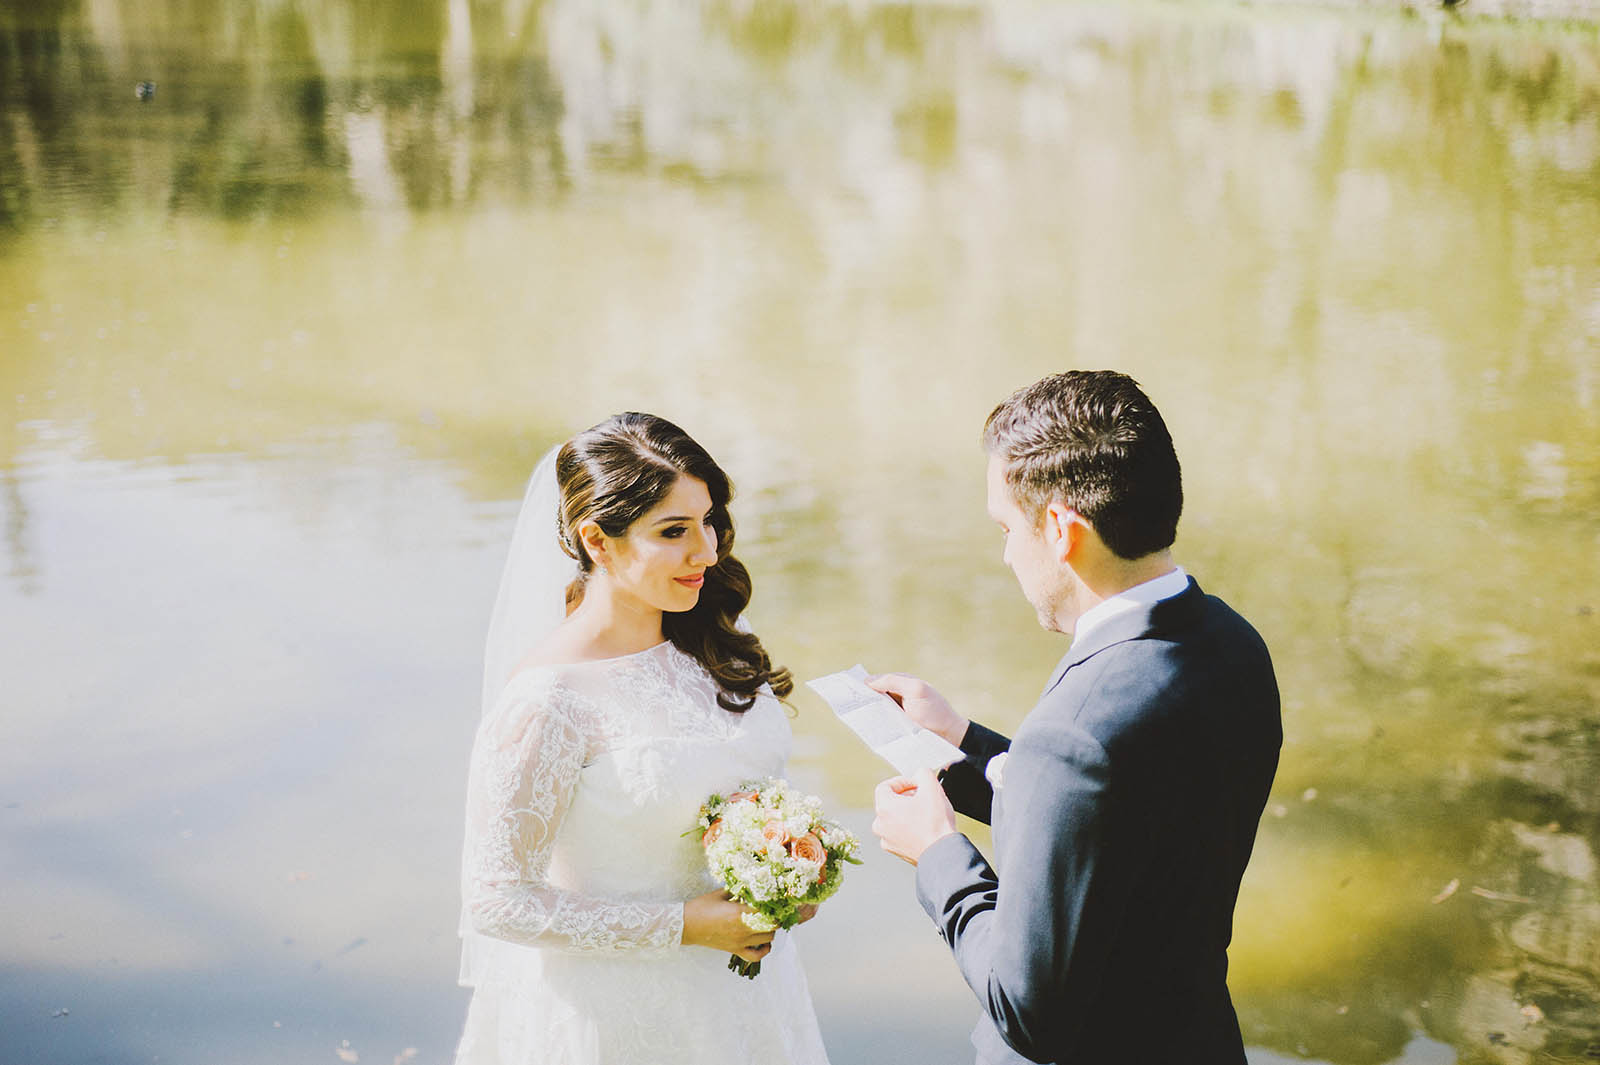 springtime-paris-elopement-kimsmithmiller-021